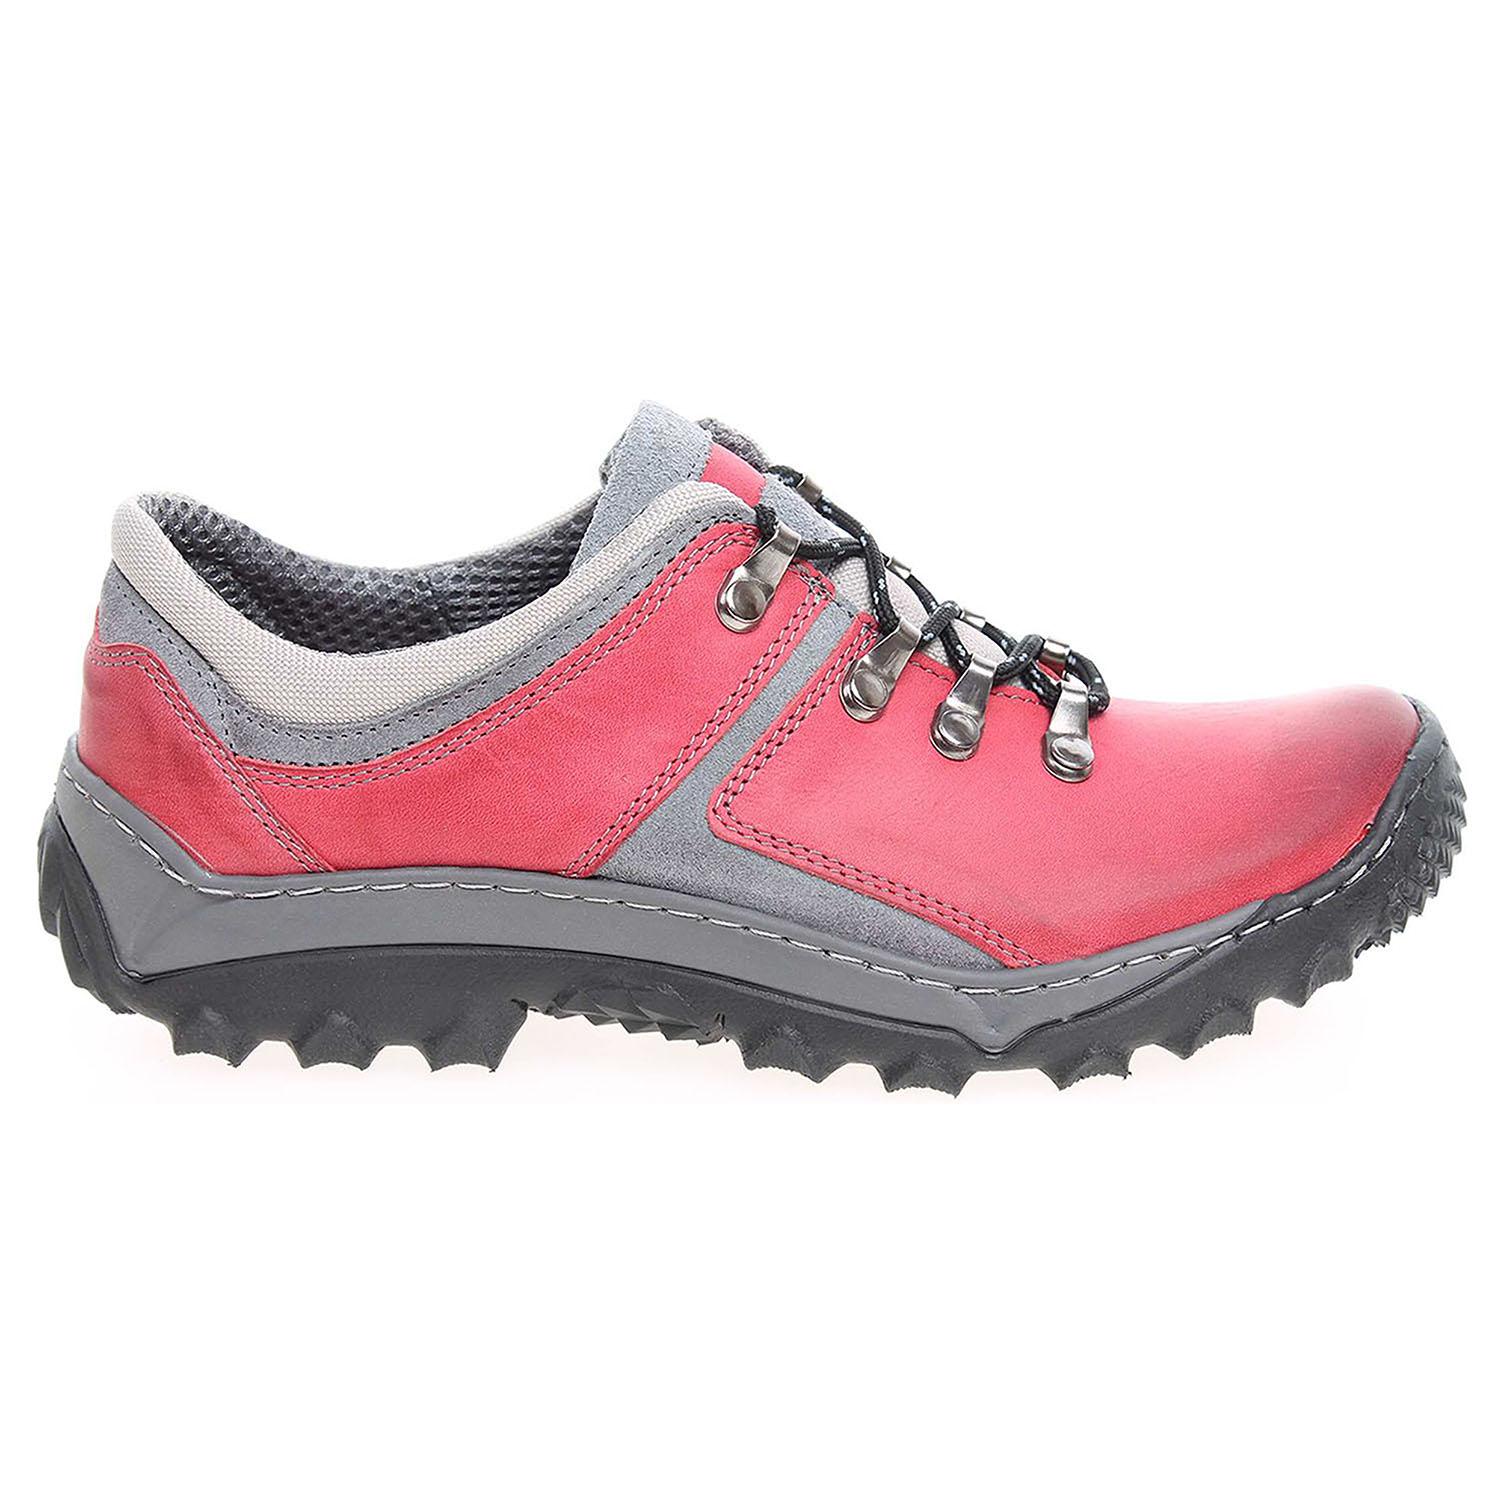 Ecco Dámská vycházková obuv EF188crc červená 23200571